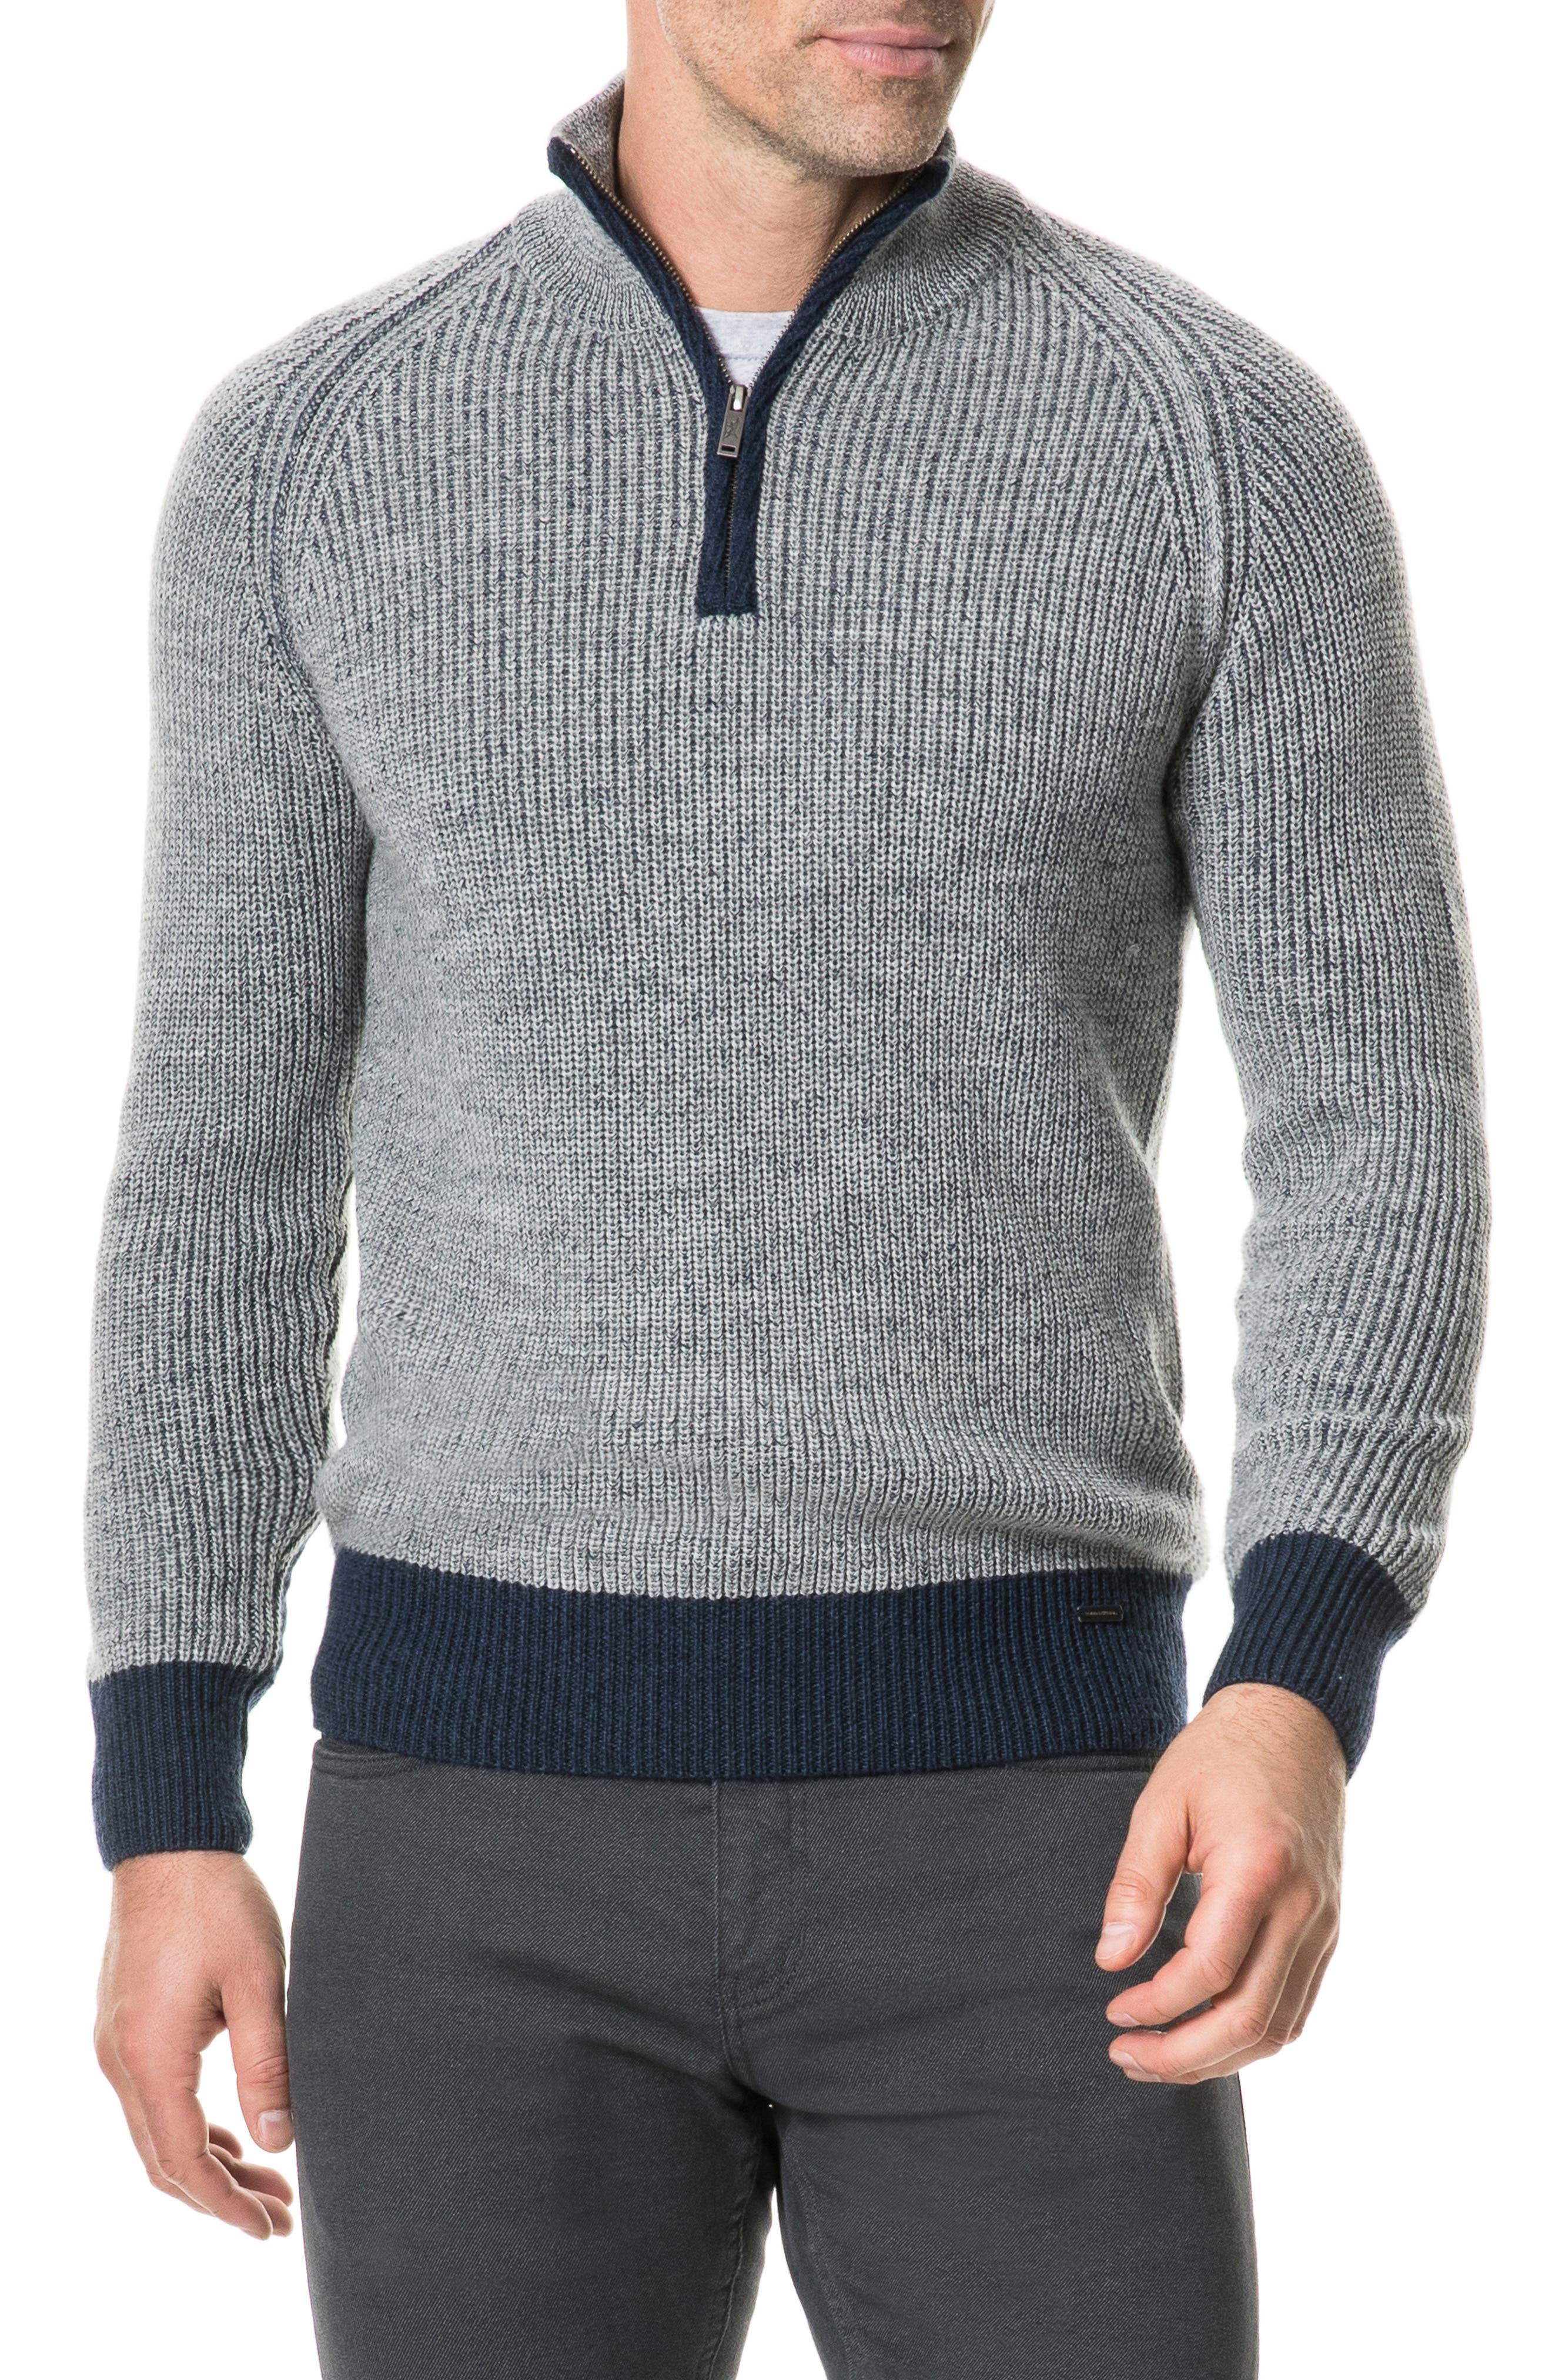 Mackinder Quarter Zip Merino Wool Sweater,                         Main,                         color, 268